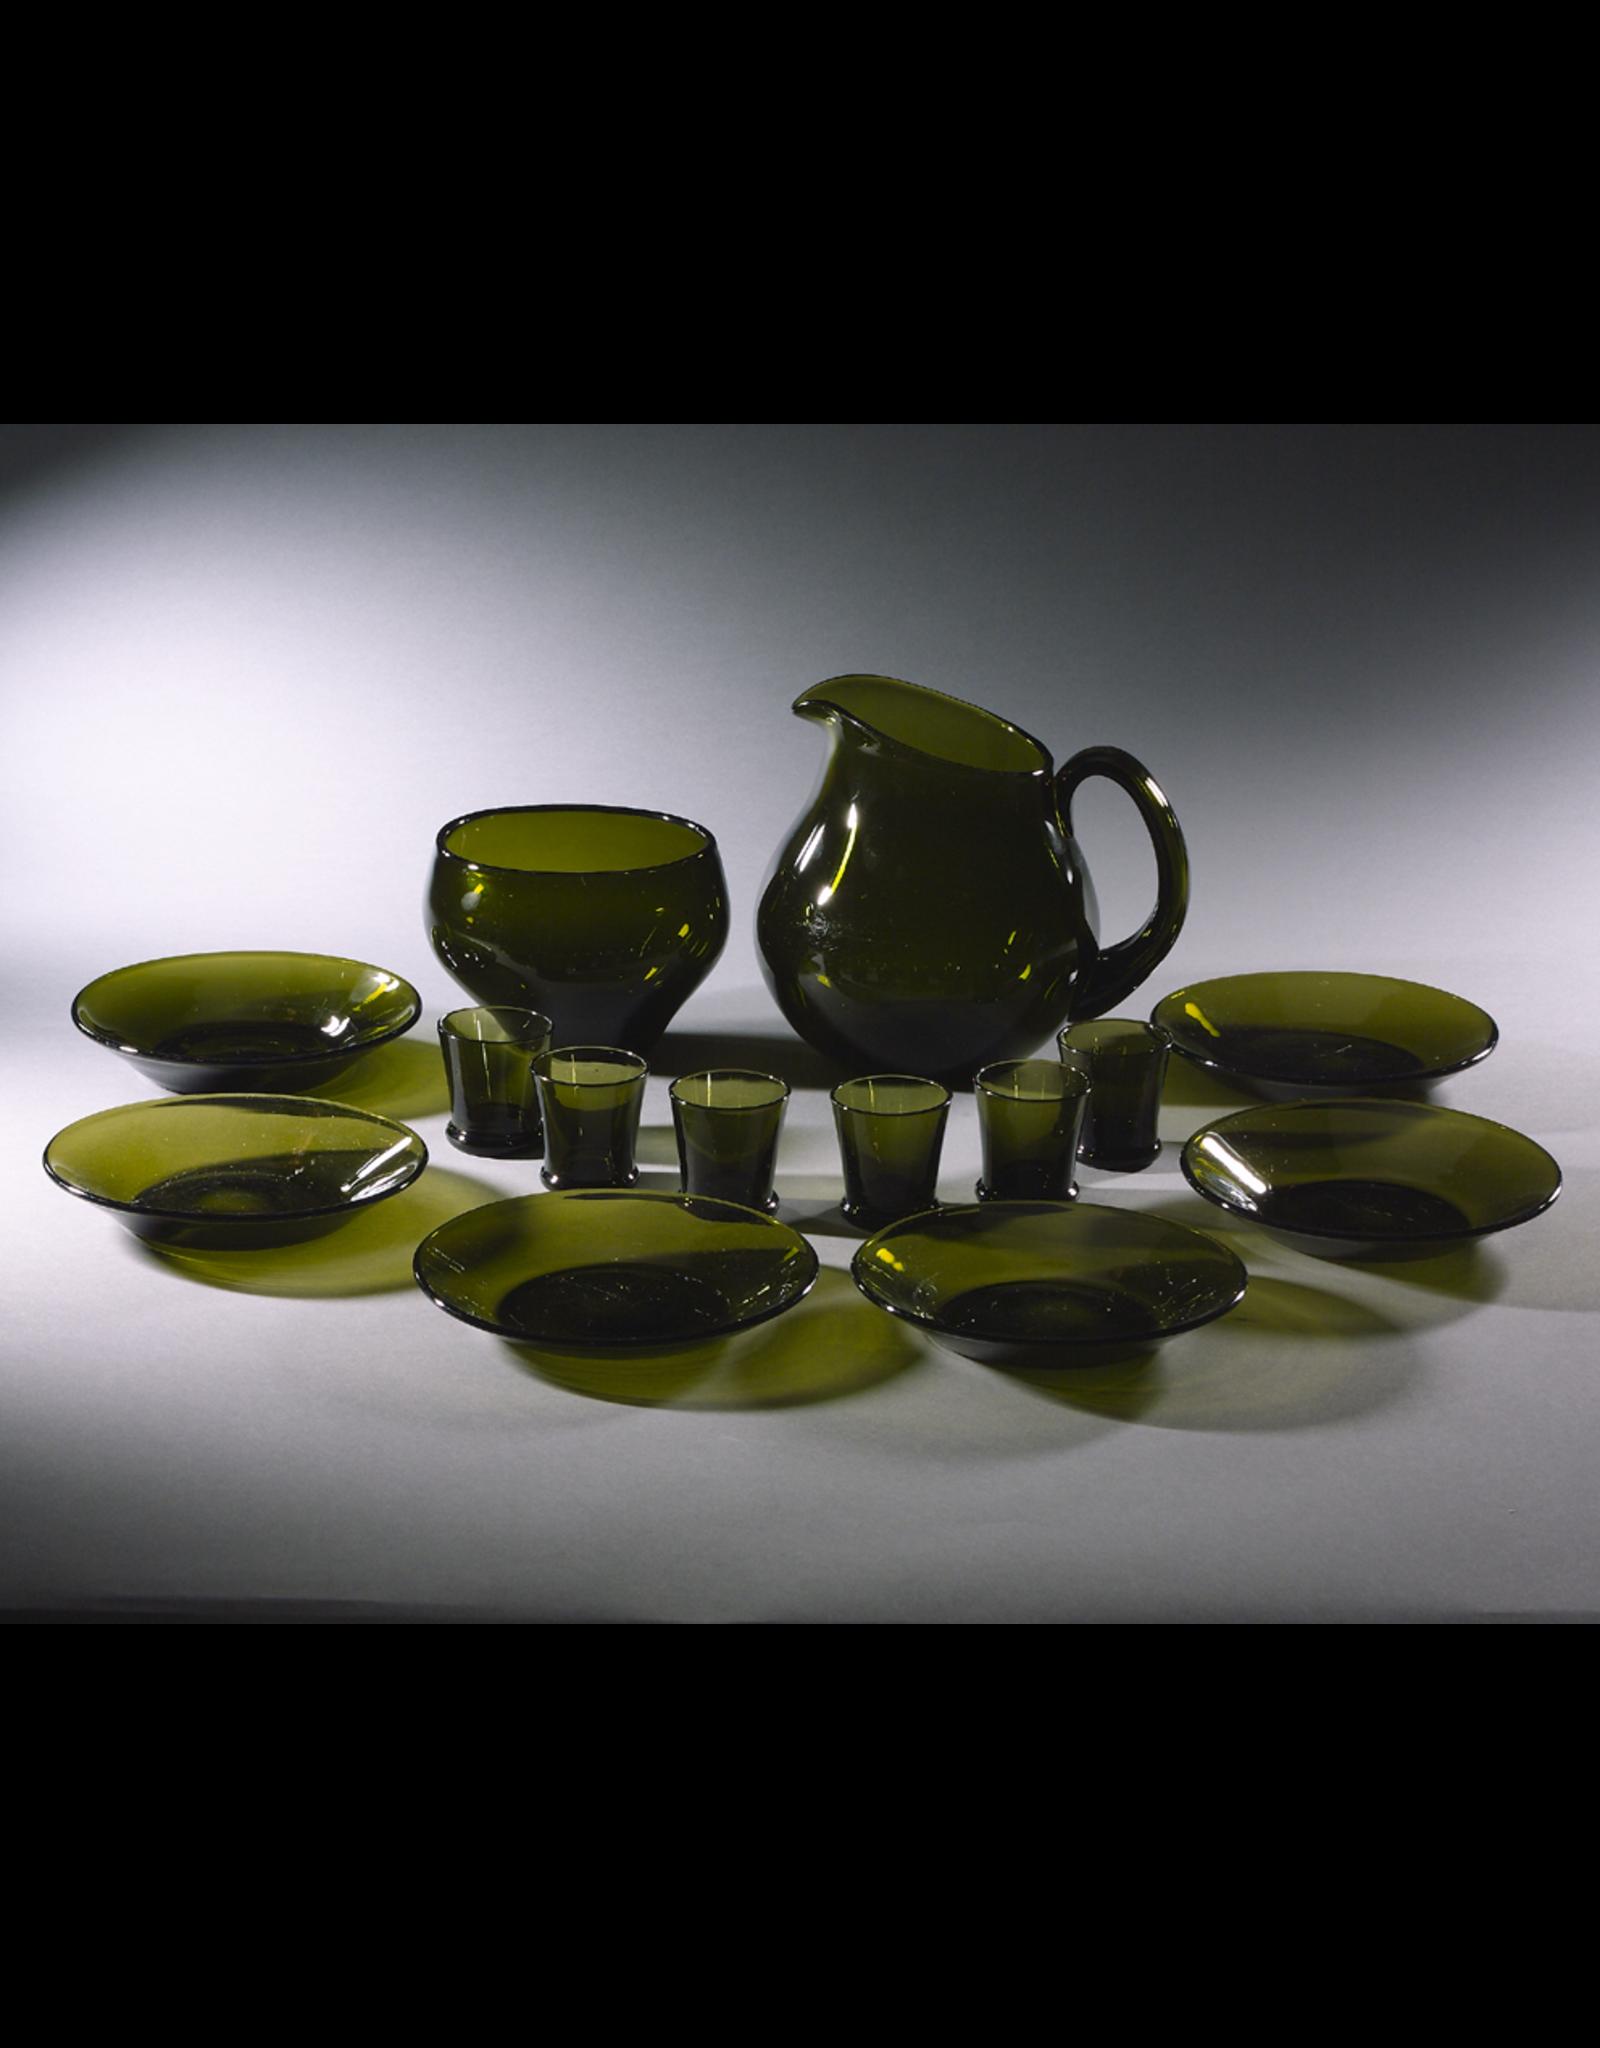 TUPA HAND-BLOWN MOSS-GREEN GLASS LIQUEUR SERVICE FOR SIXFINLAND, c1950